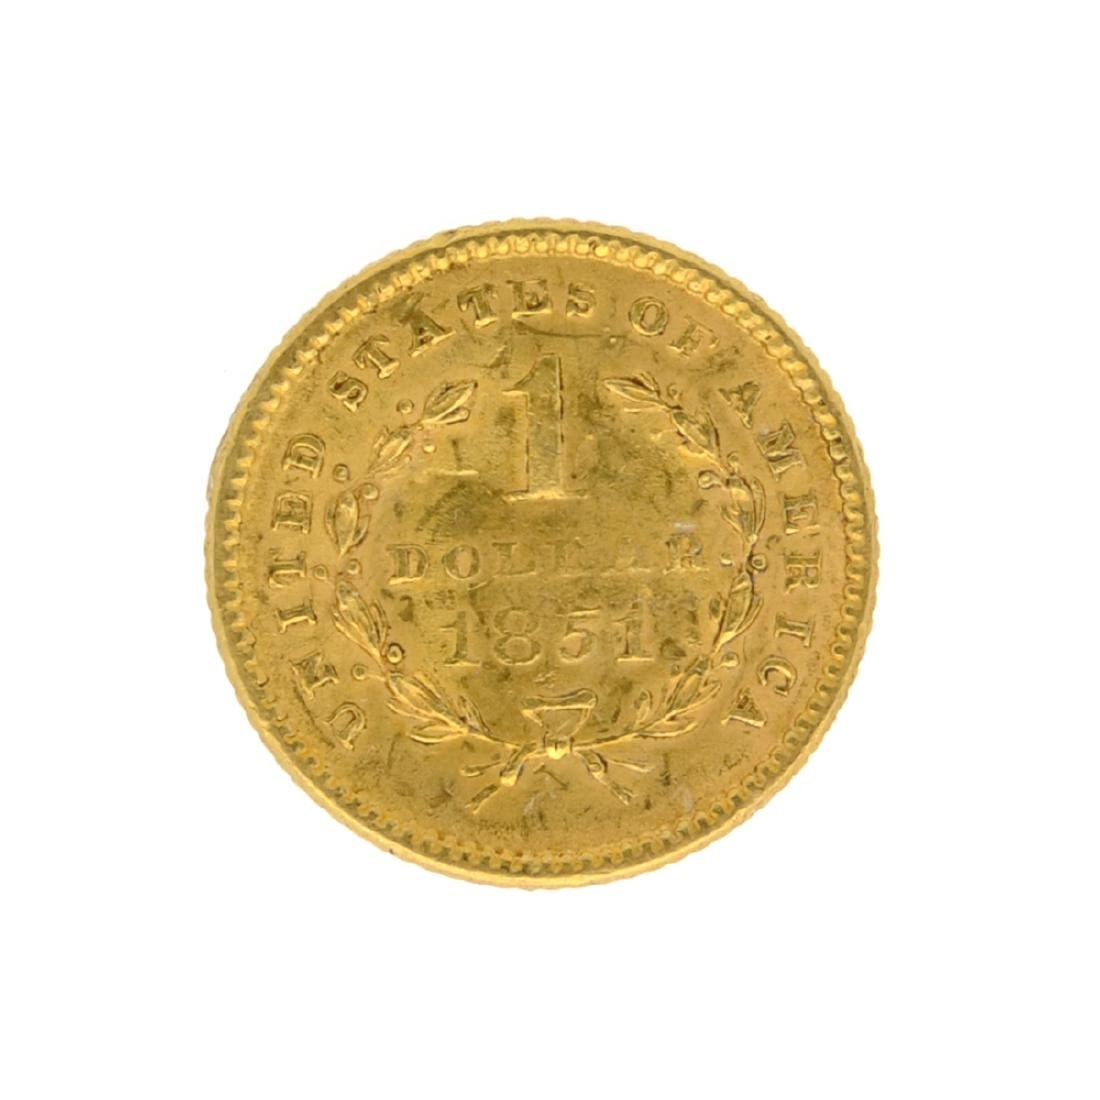 *1851 $1 U.S. Liberty Head Gold Coin (JG-N) - 2